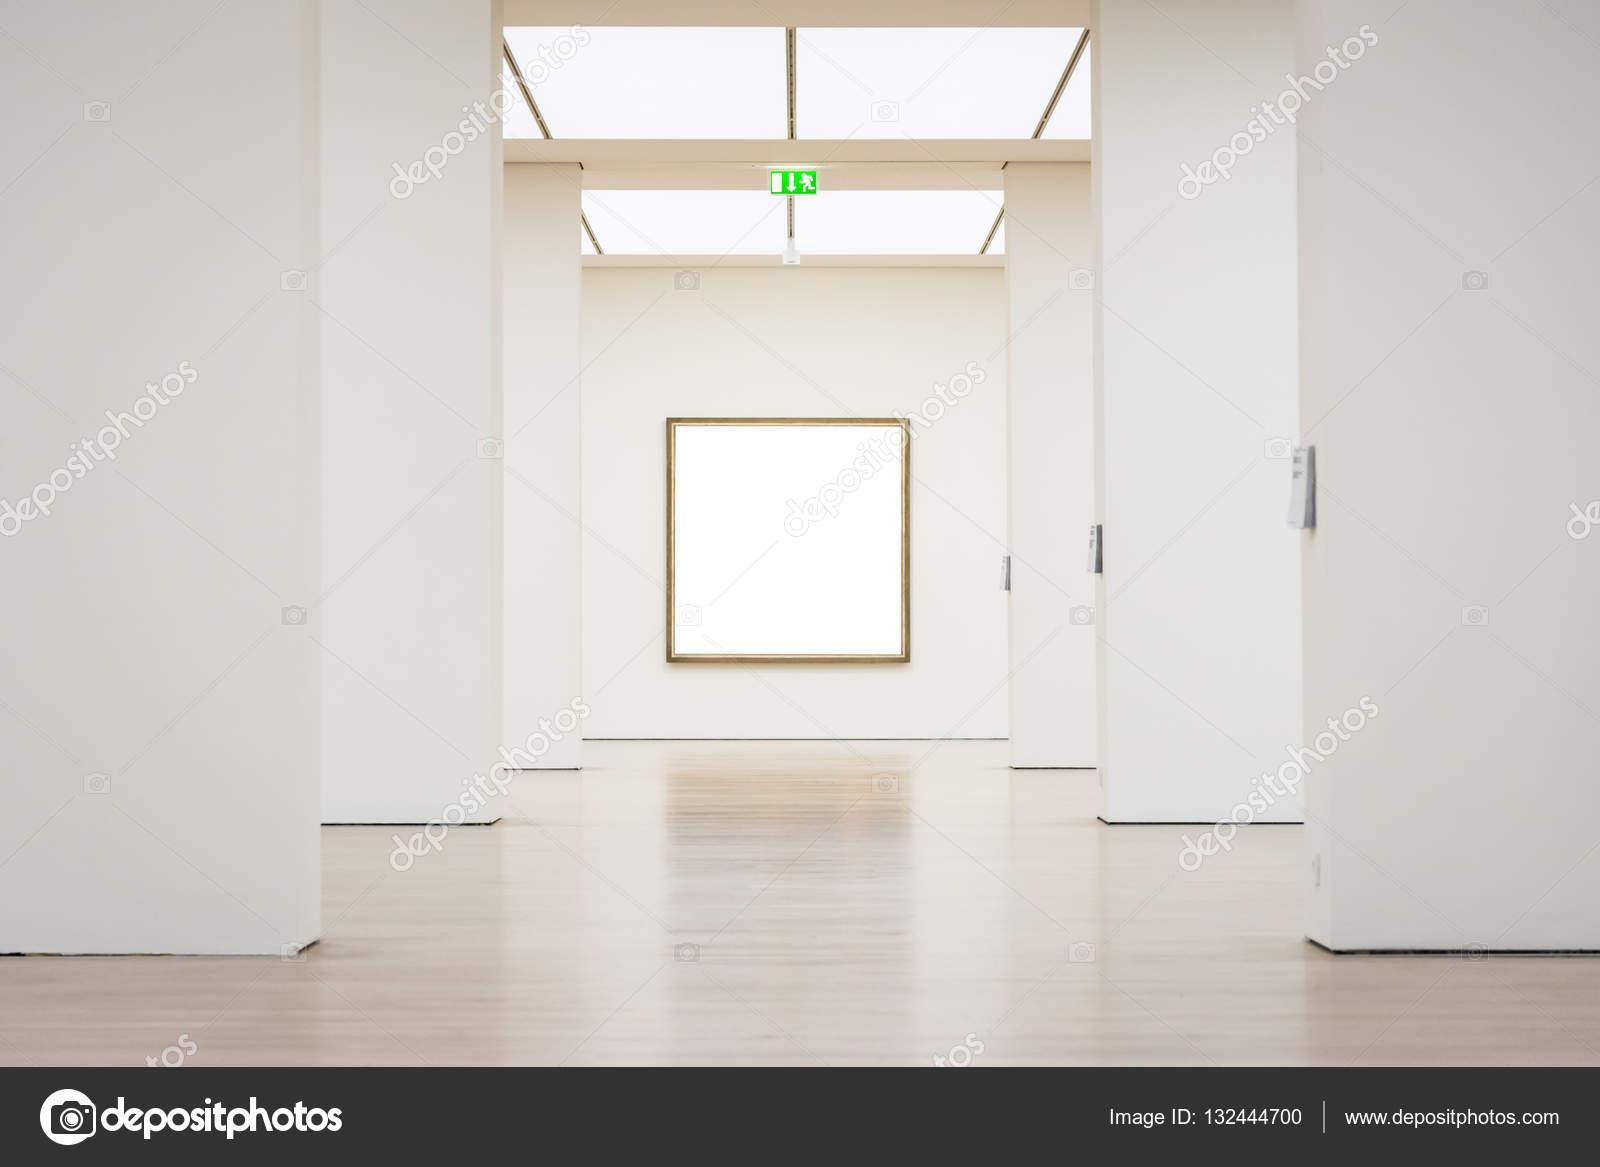 Museo de arte moderno marco pared recorte Vector blanco camino ...